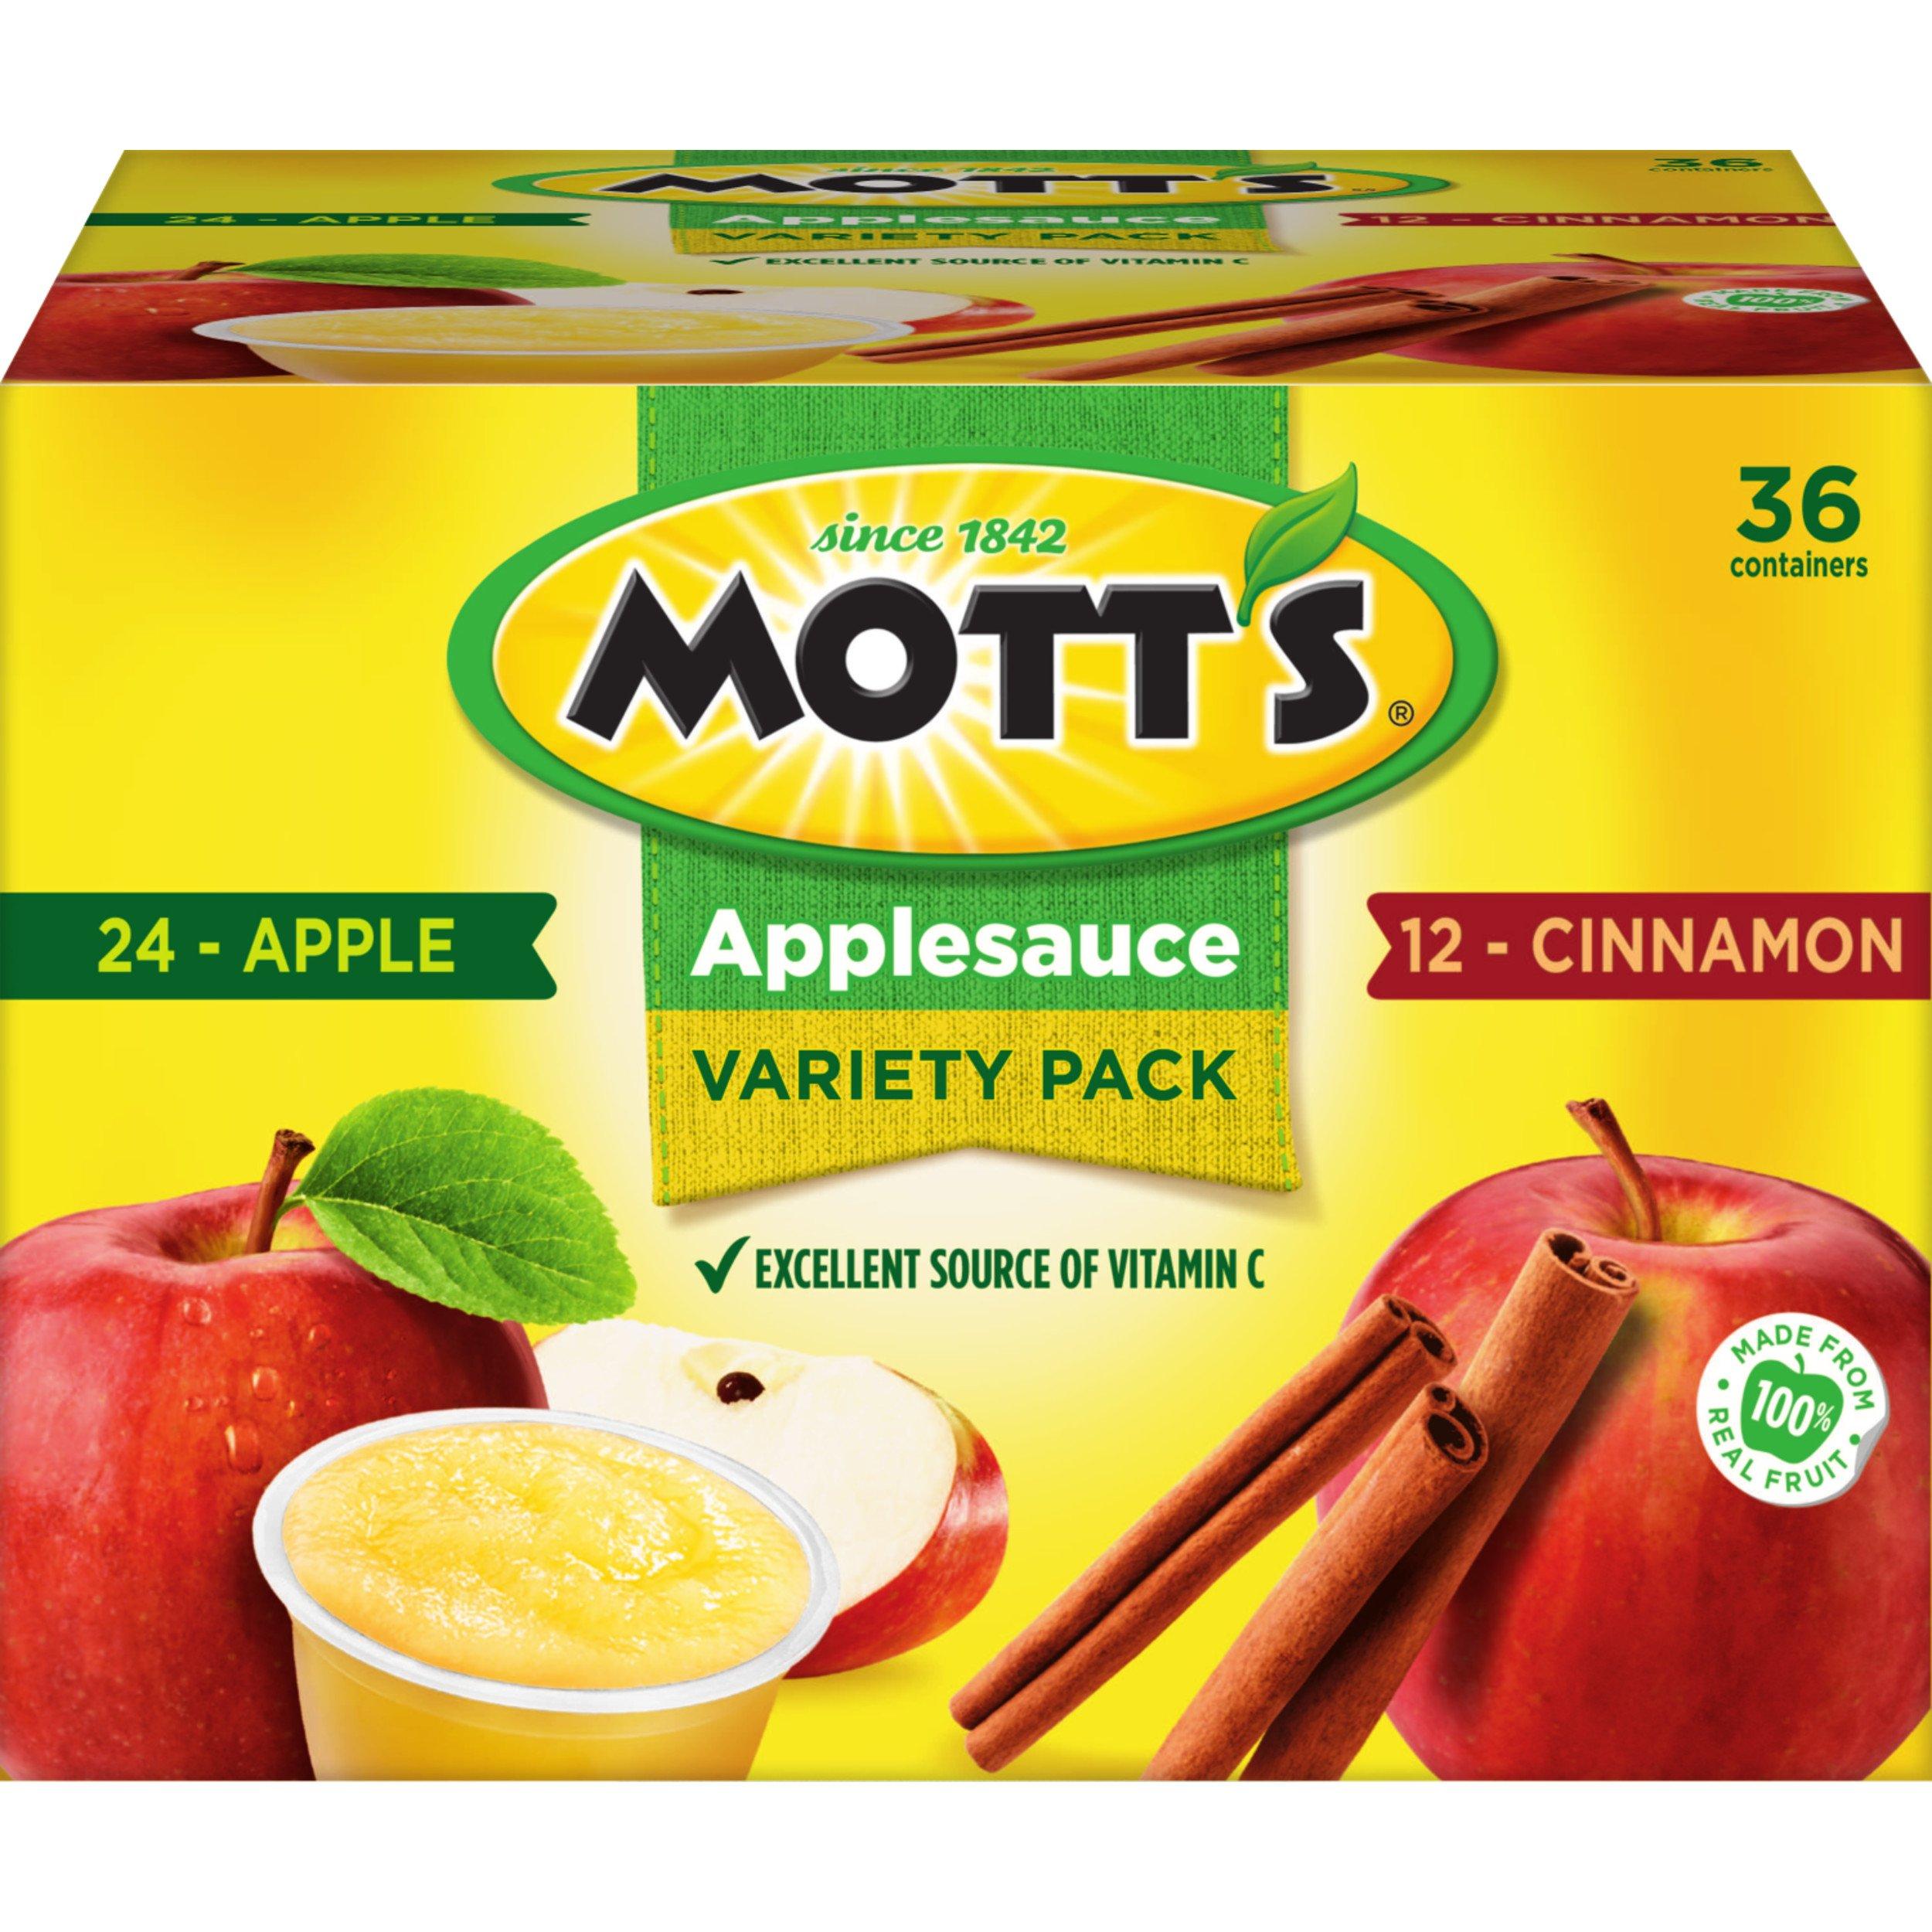 Mott's Apple & Cinnamon Variety Pack Applesauce, 4 oz cups, 36 count by Mott's